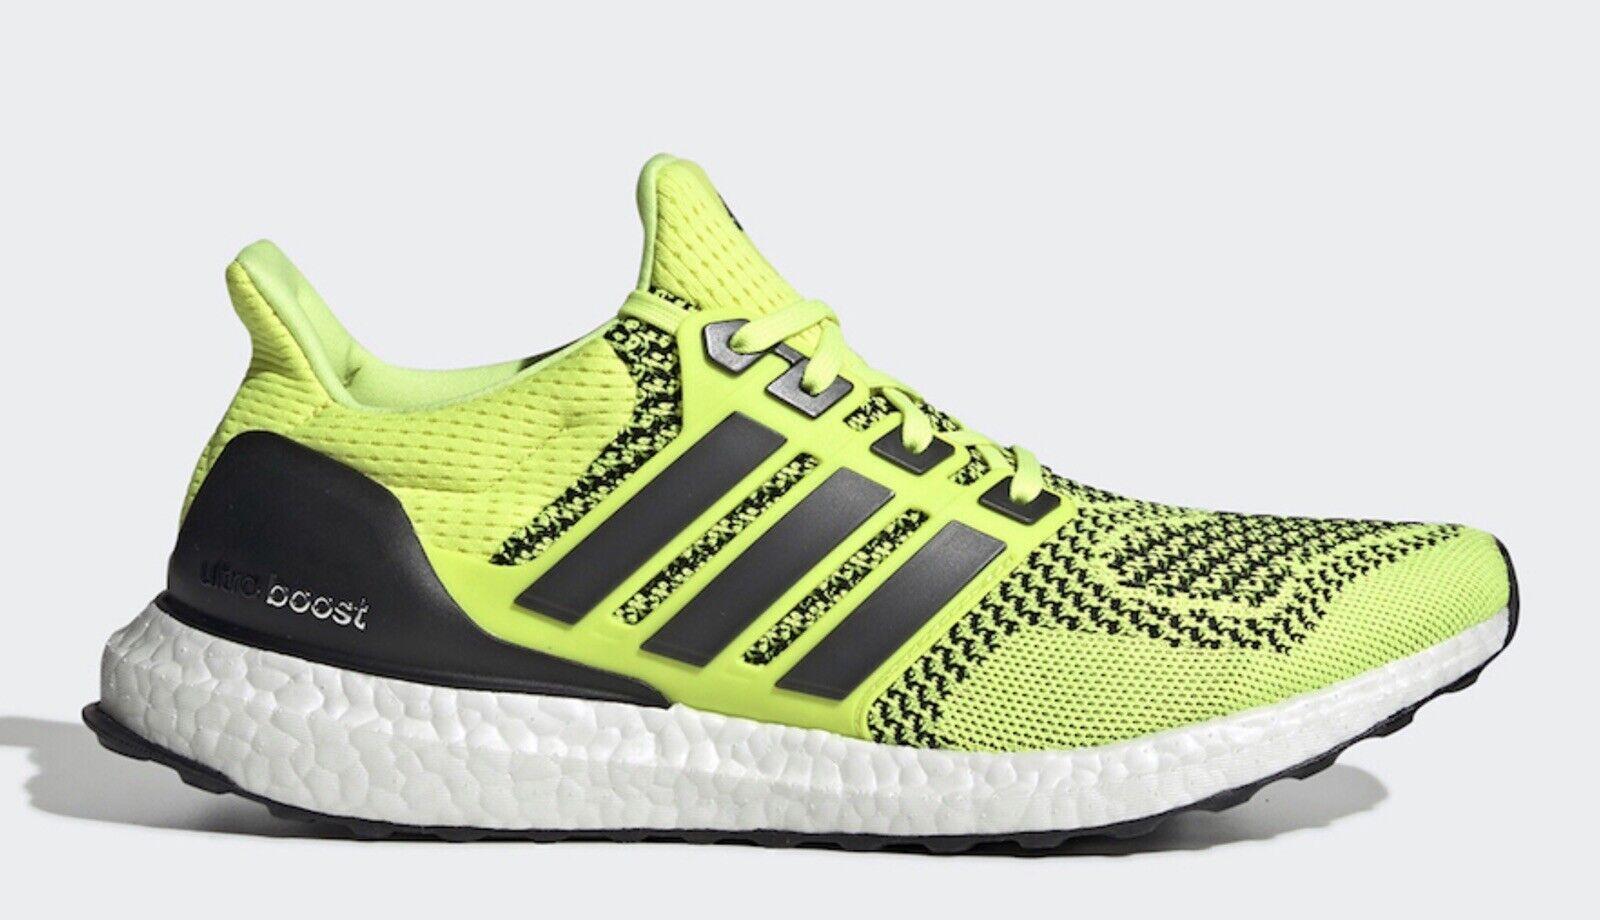 Adidas Ultra Boost 1.0 Solar Gelb NEU EUR 44 UK 9,5 US 10